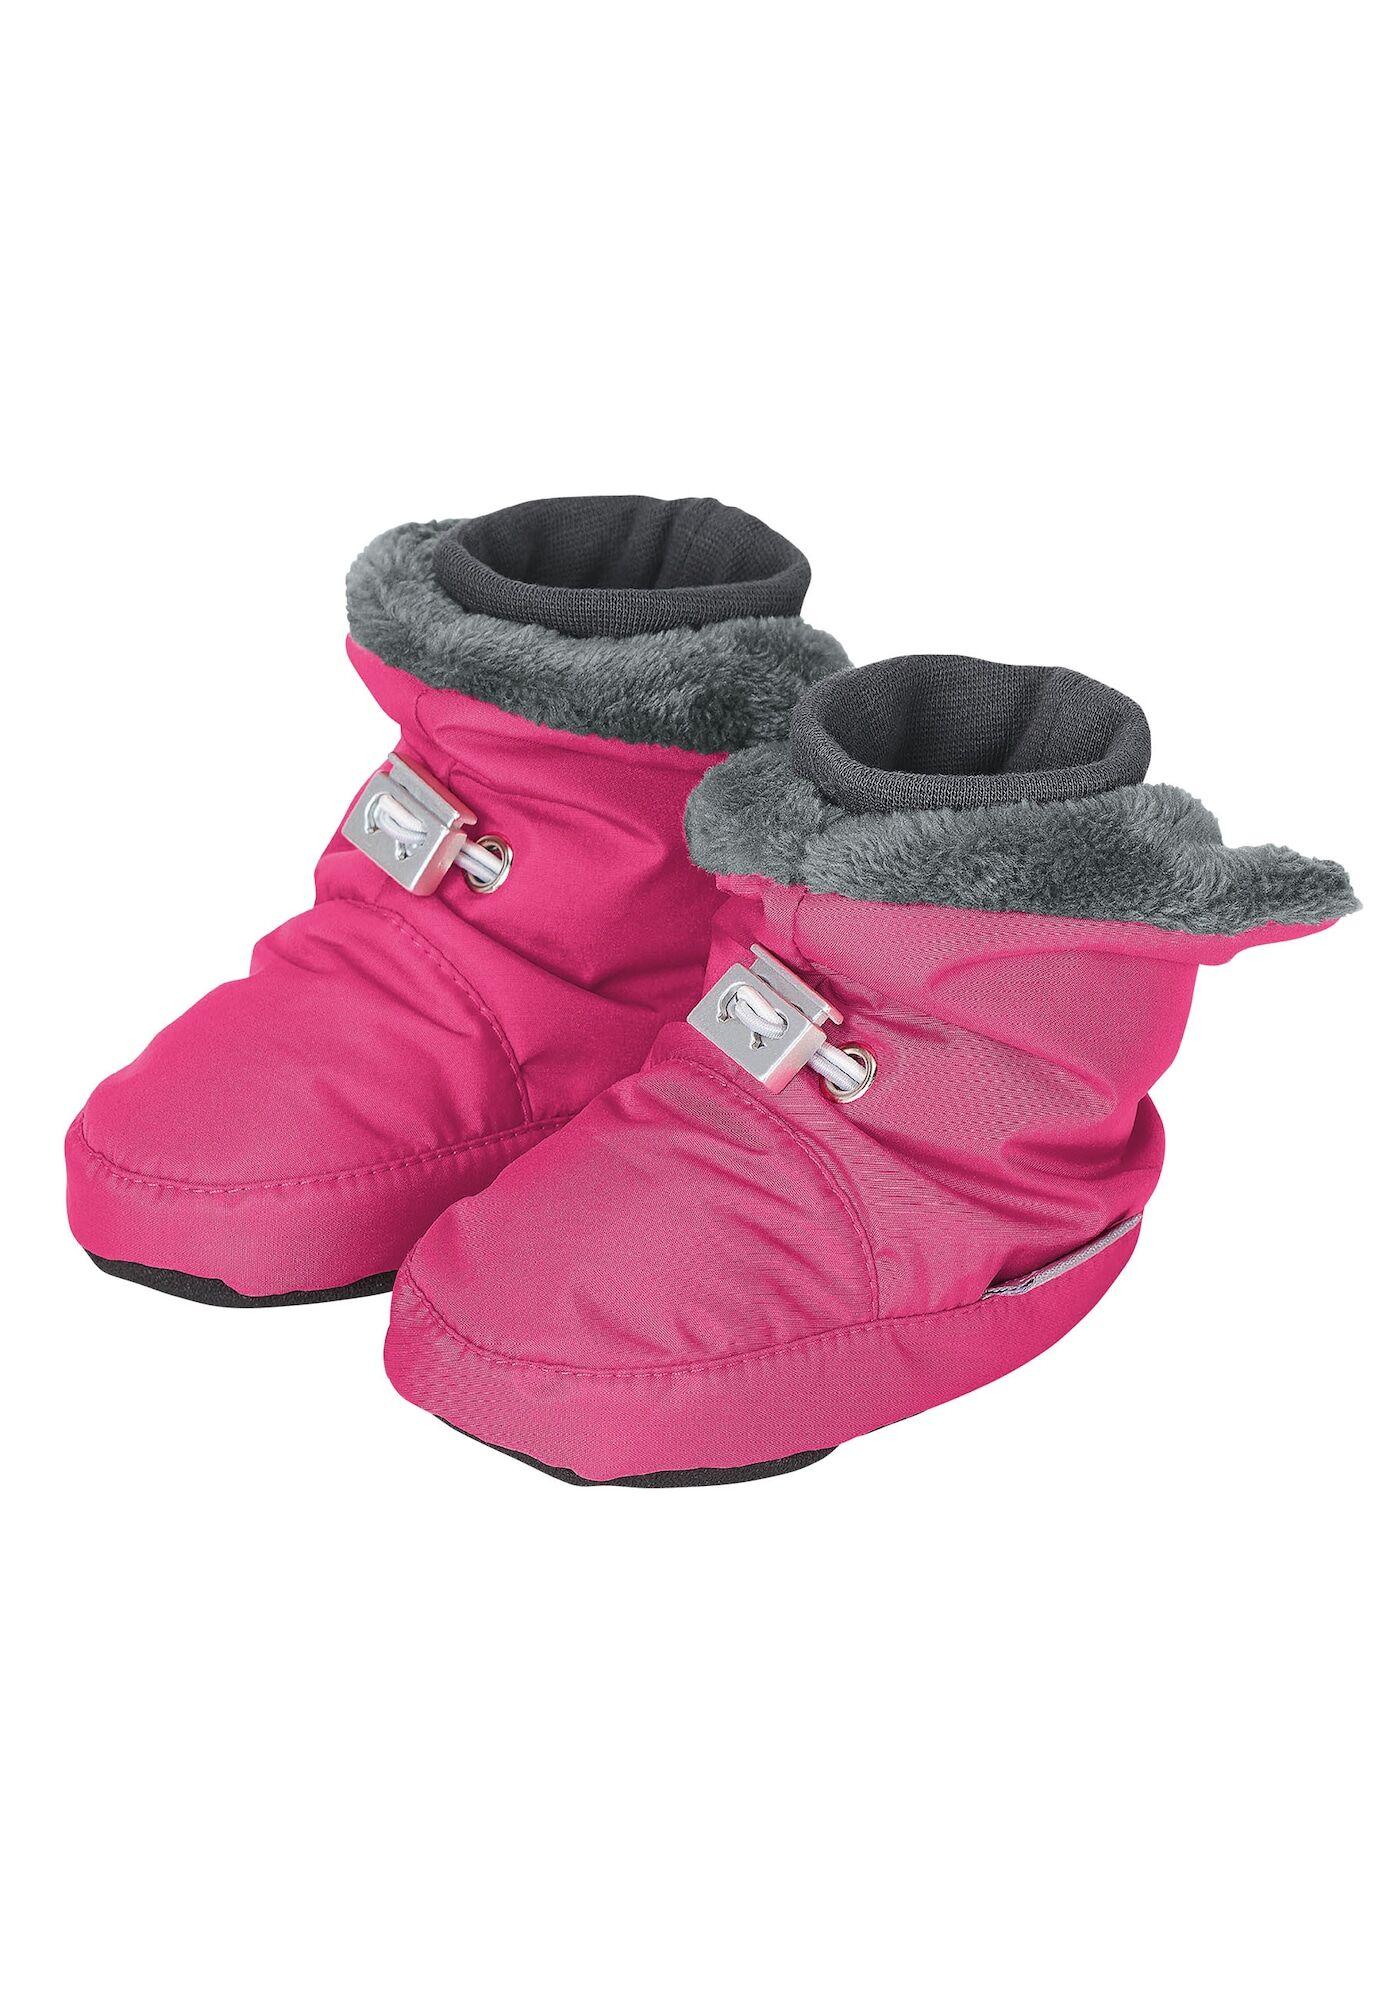 STERNTALER Bottes de neige  - Rose - Taille: 20 - kids